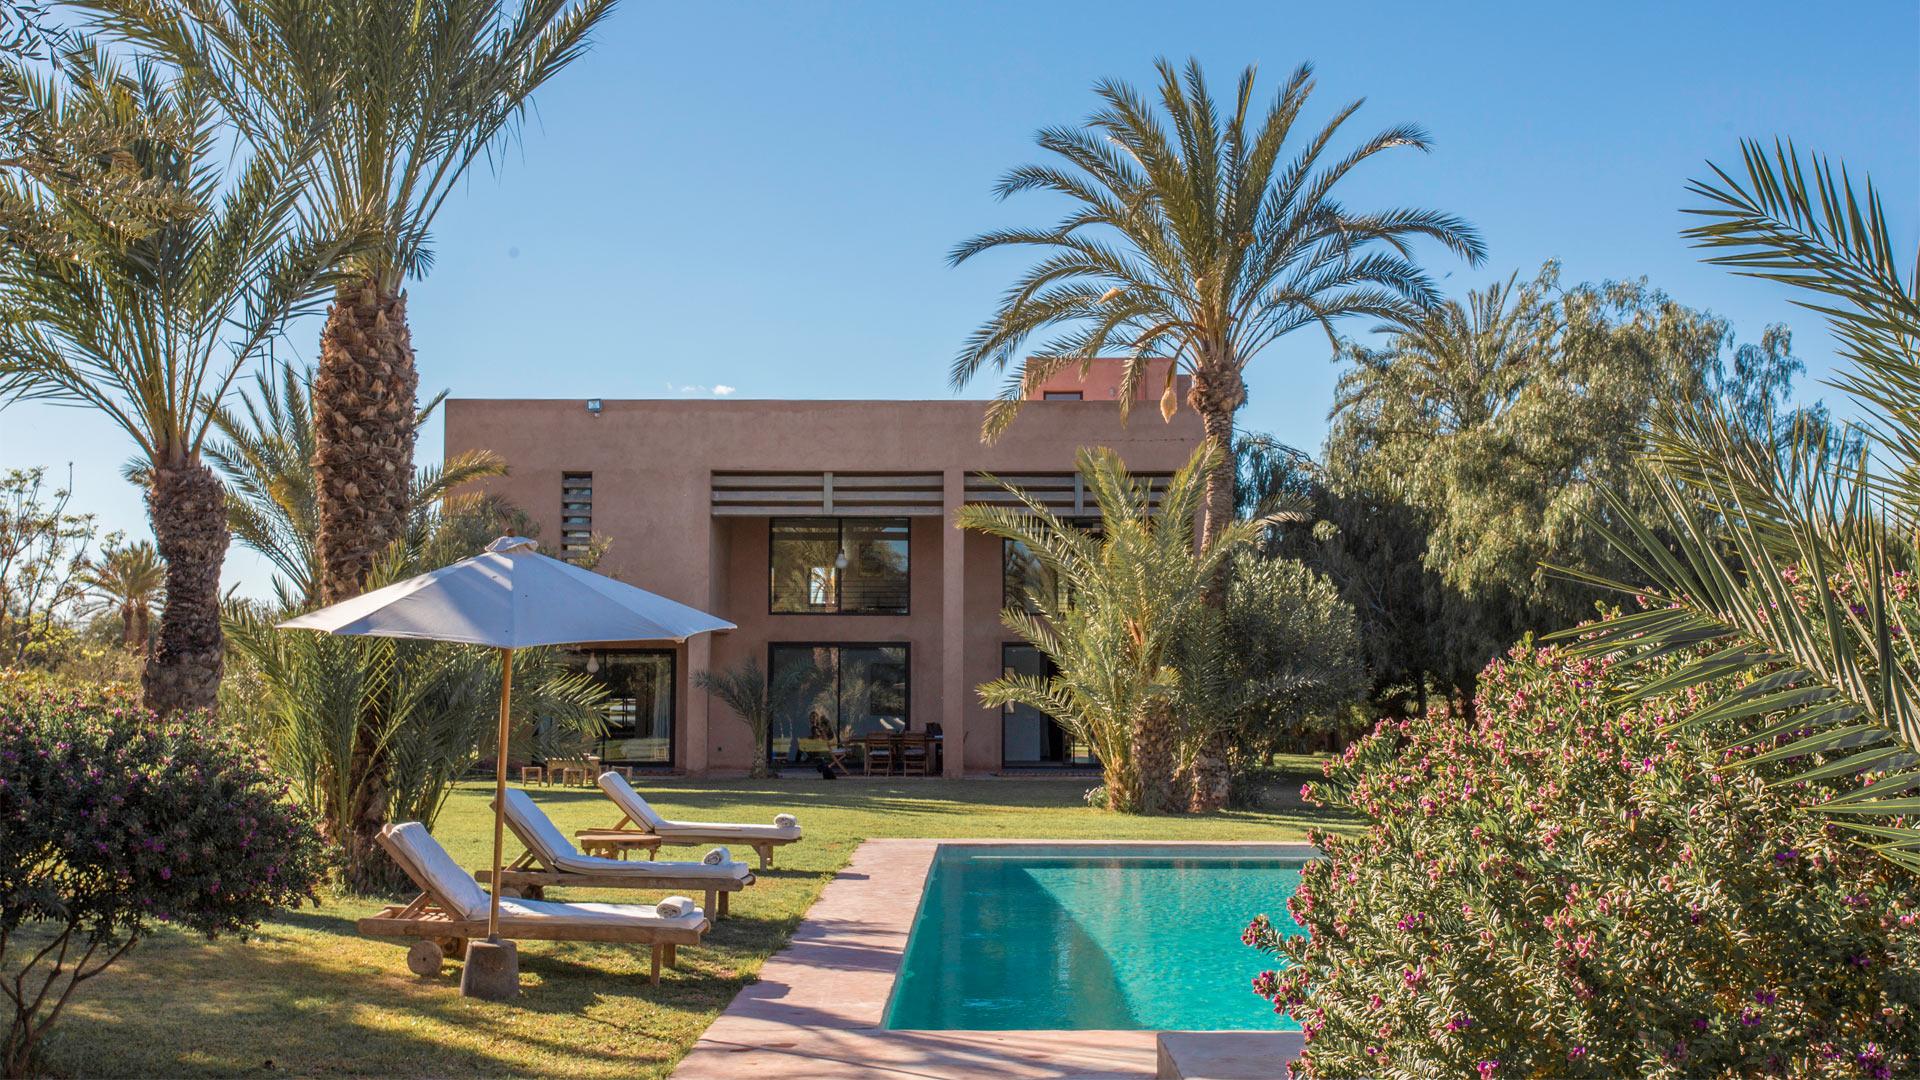 Villa La Maison de Marion, Rental in Marrakech